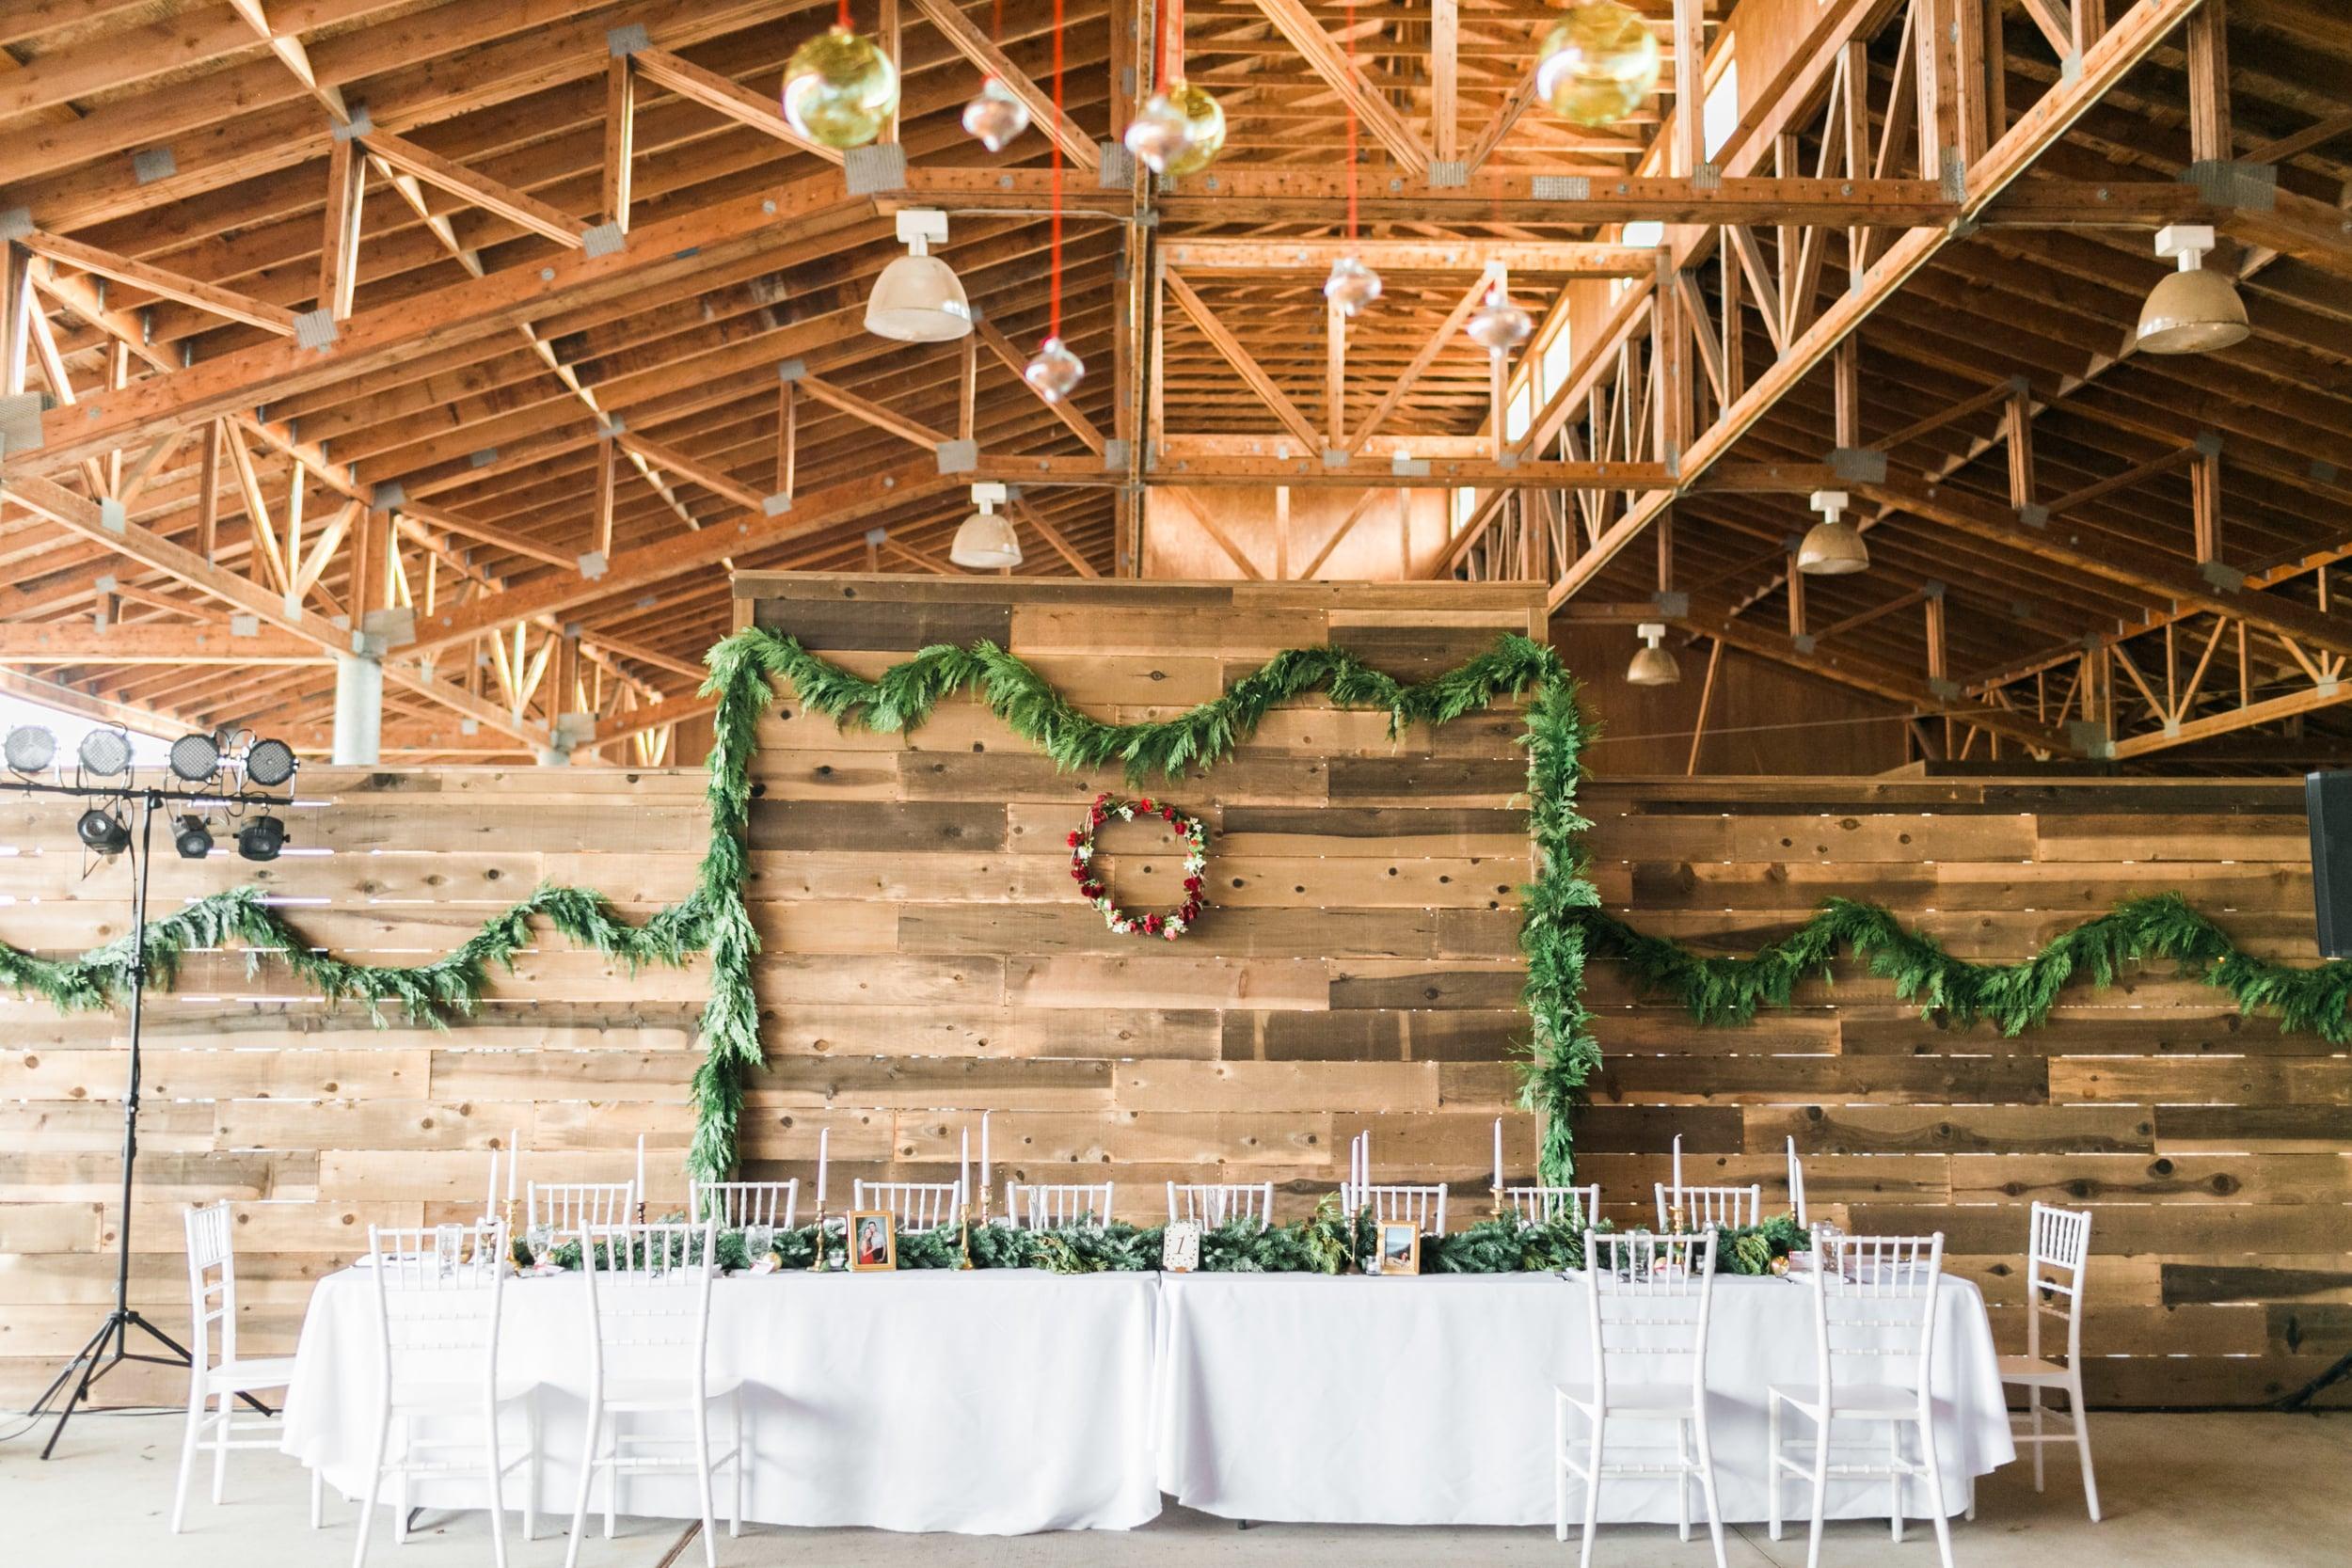 Natalie_Schutt_Photography_Winter_Wedding_San_Luis_Obispo-64.jpg